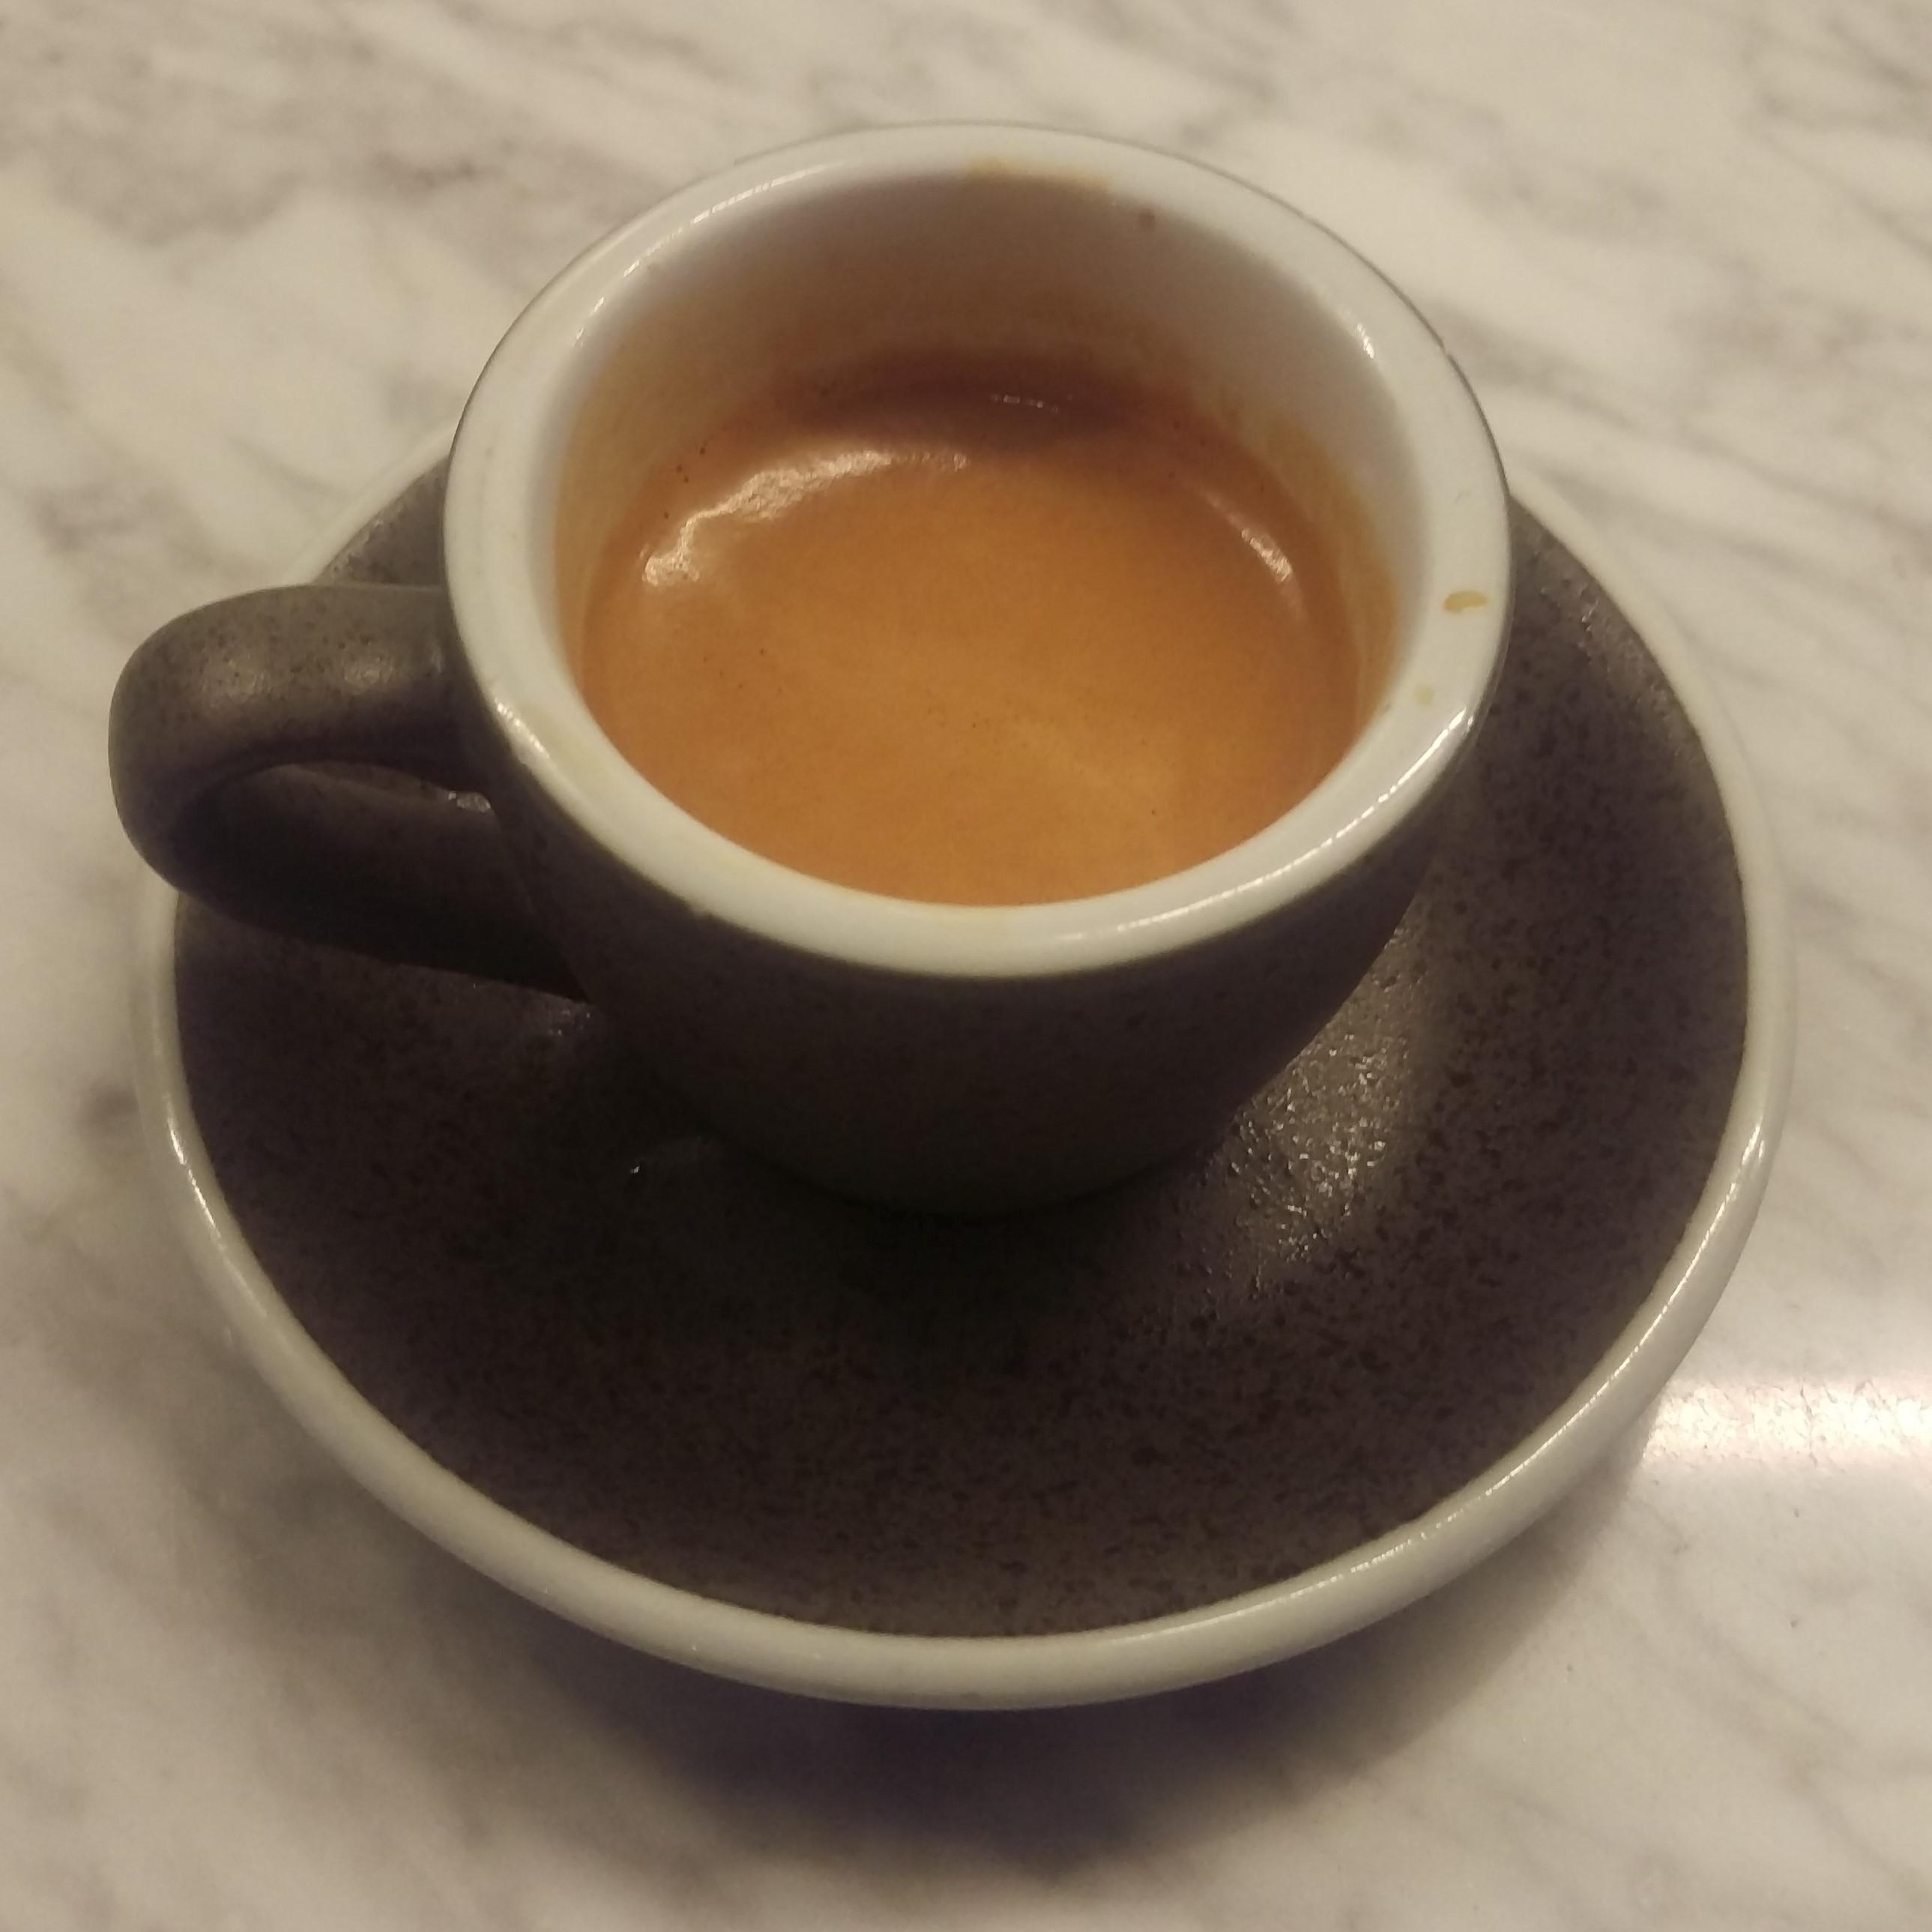 A lovely Brazilian single-origin espresso, served in a classic cup at Press Coffee in Victoria Hall Market, London.